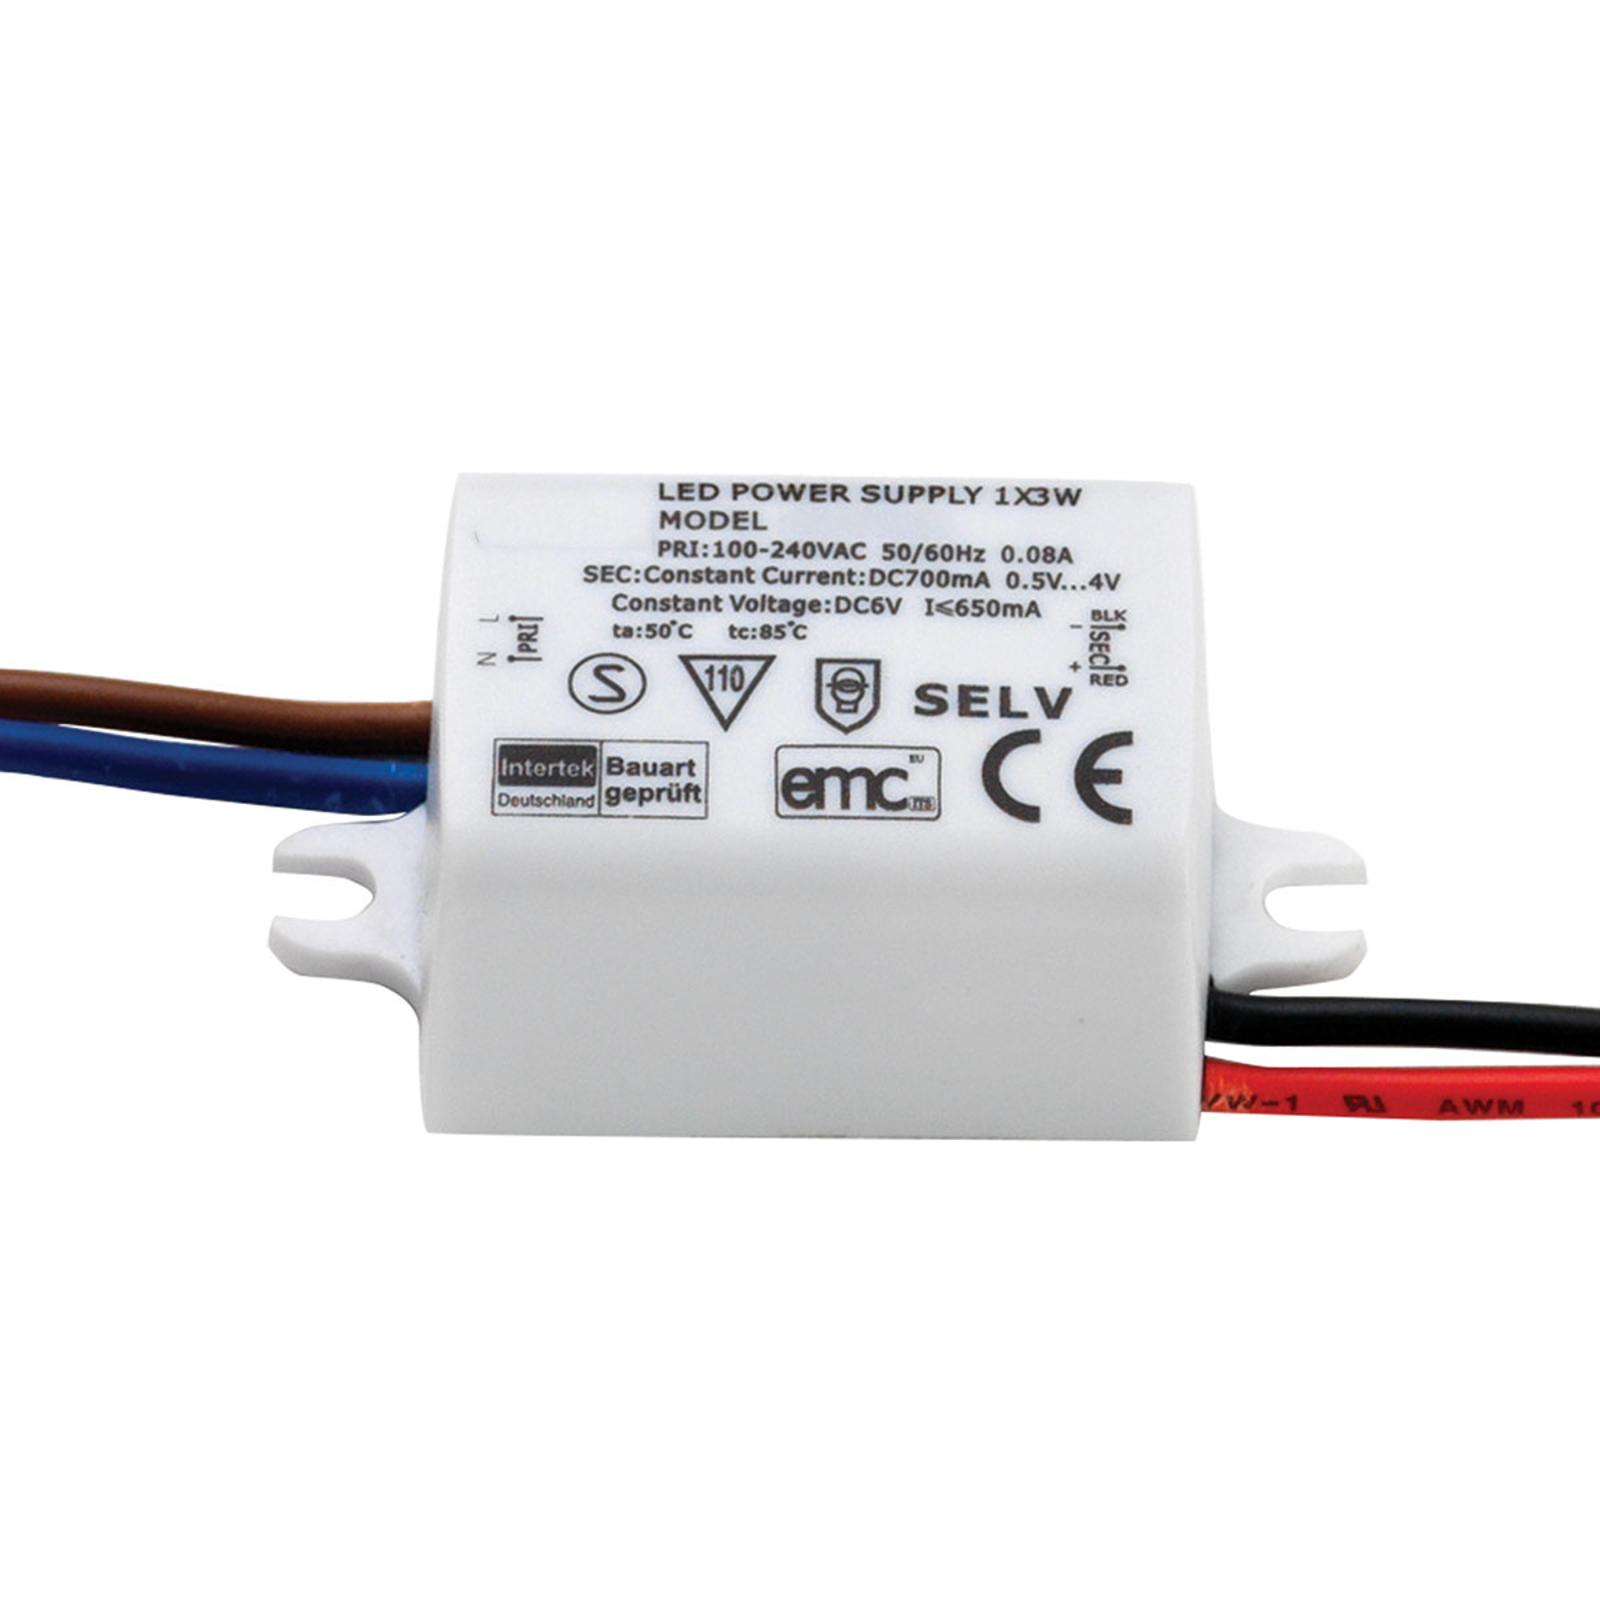 Astro LED-Treiber 2 bis 4,55 W 700 mA